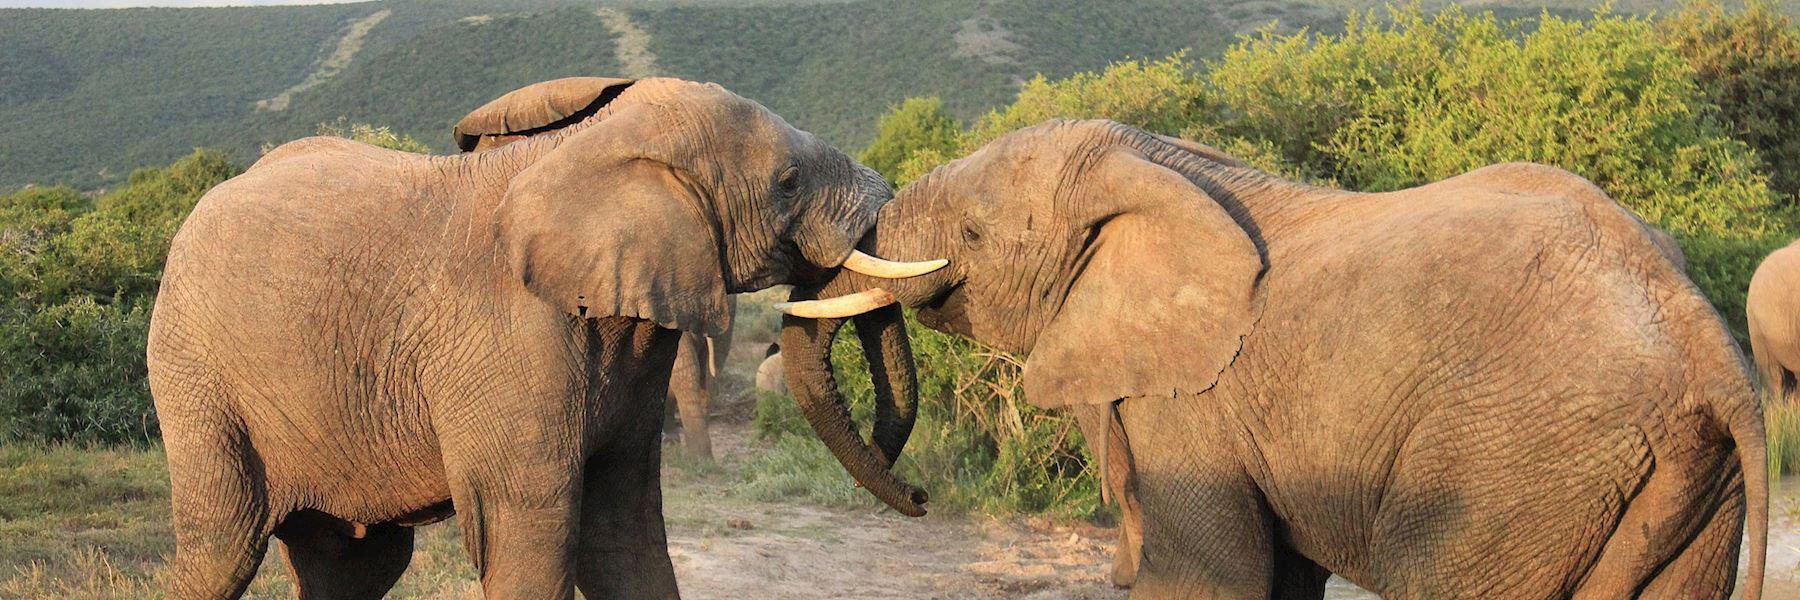 Visit Shamwari Private Game Reserve, South Africa